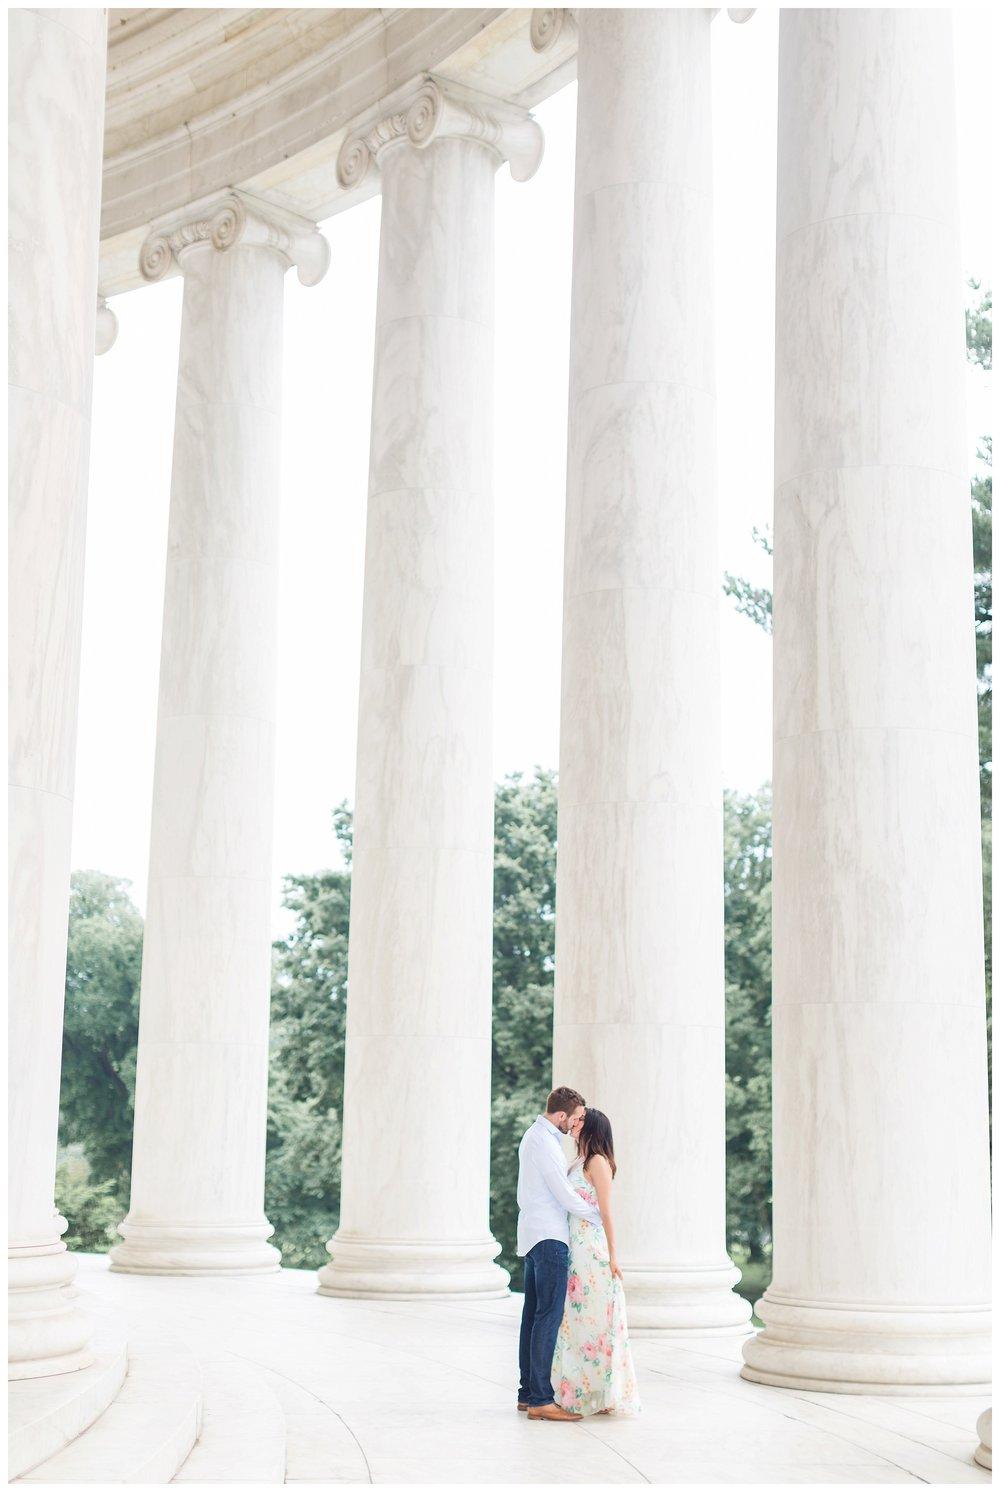 Washington DC Engagement Photos District of Columbia Wedding Photographer_0019.jpg